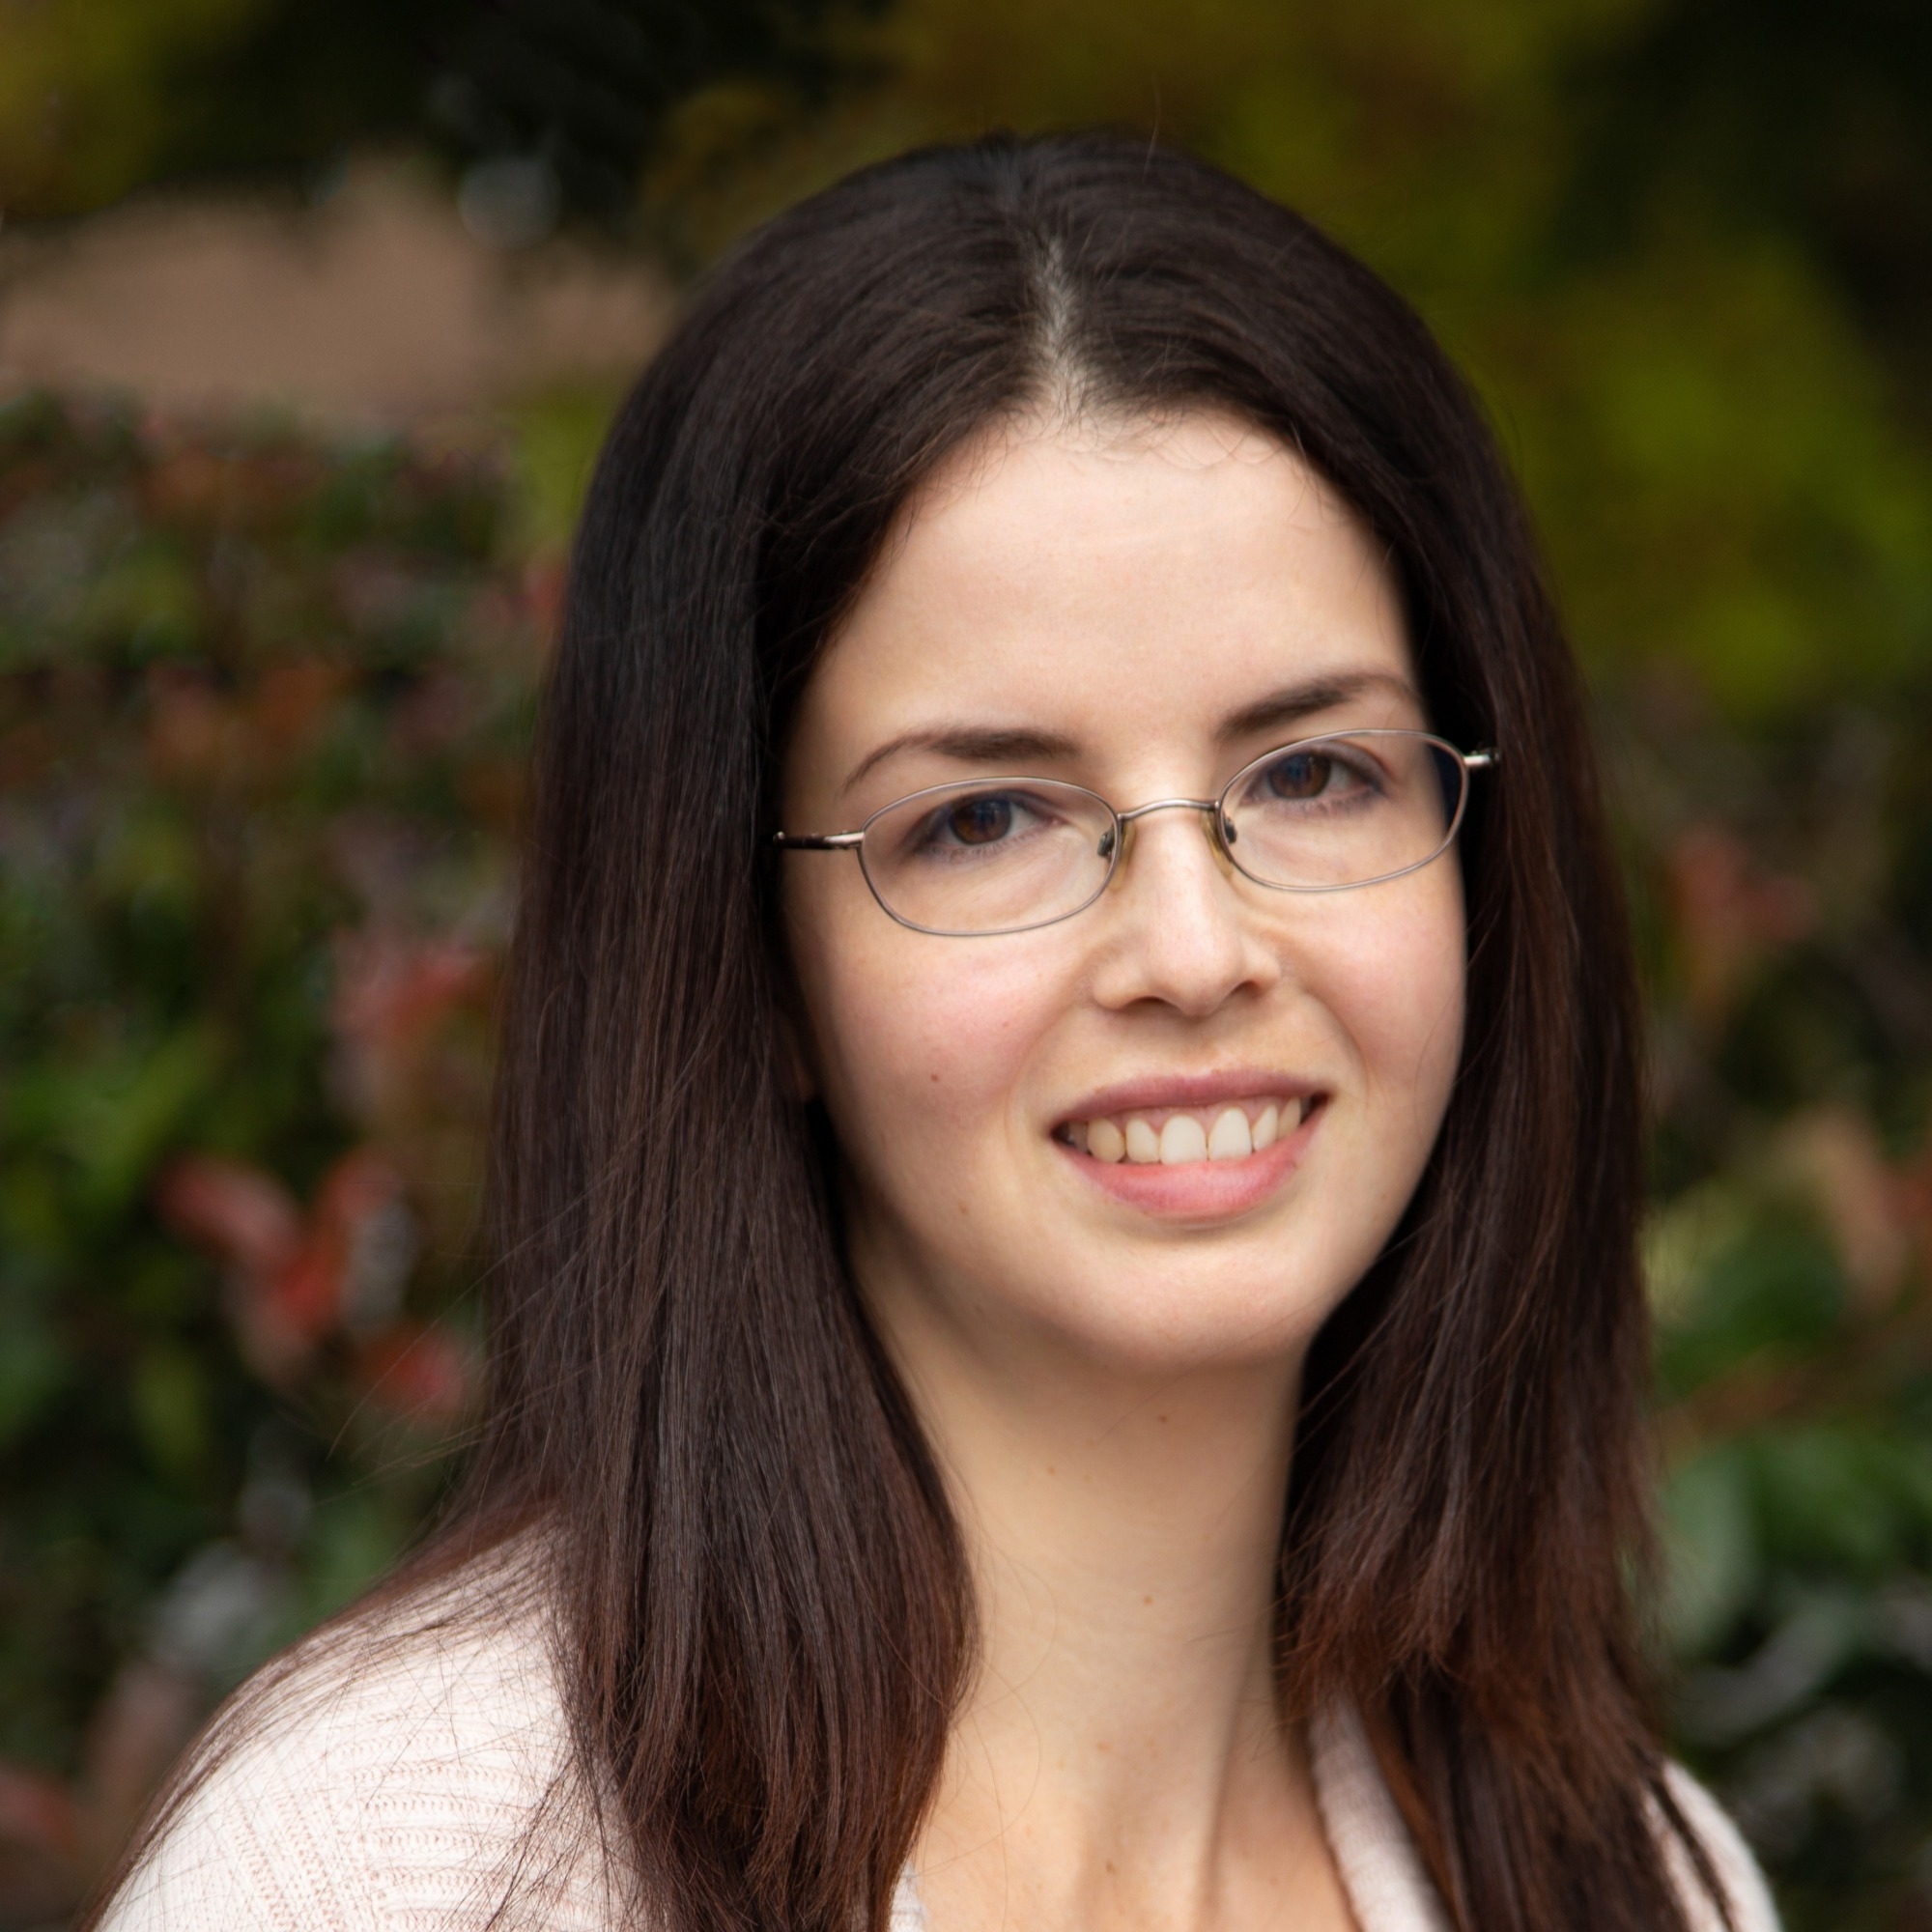 Christine Bally